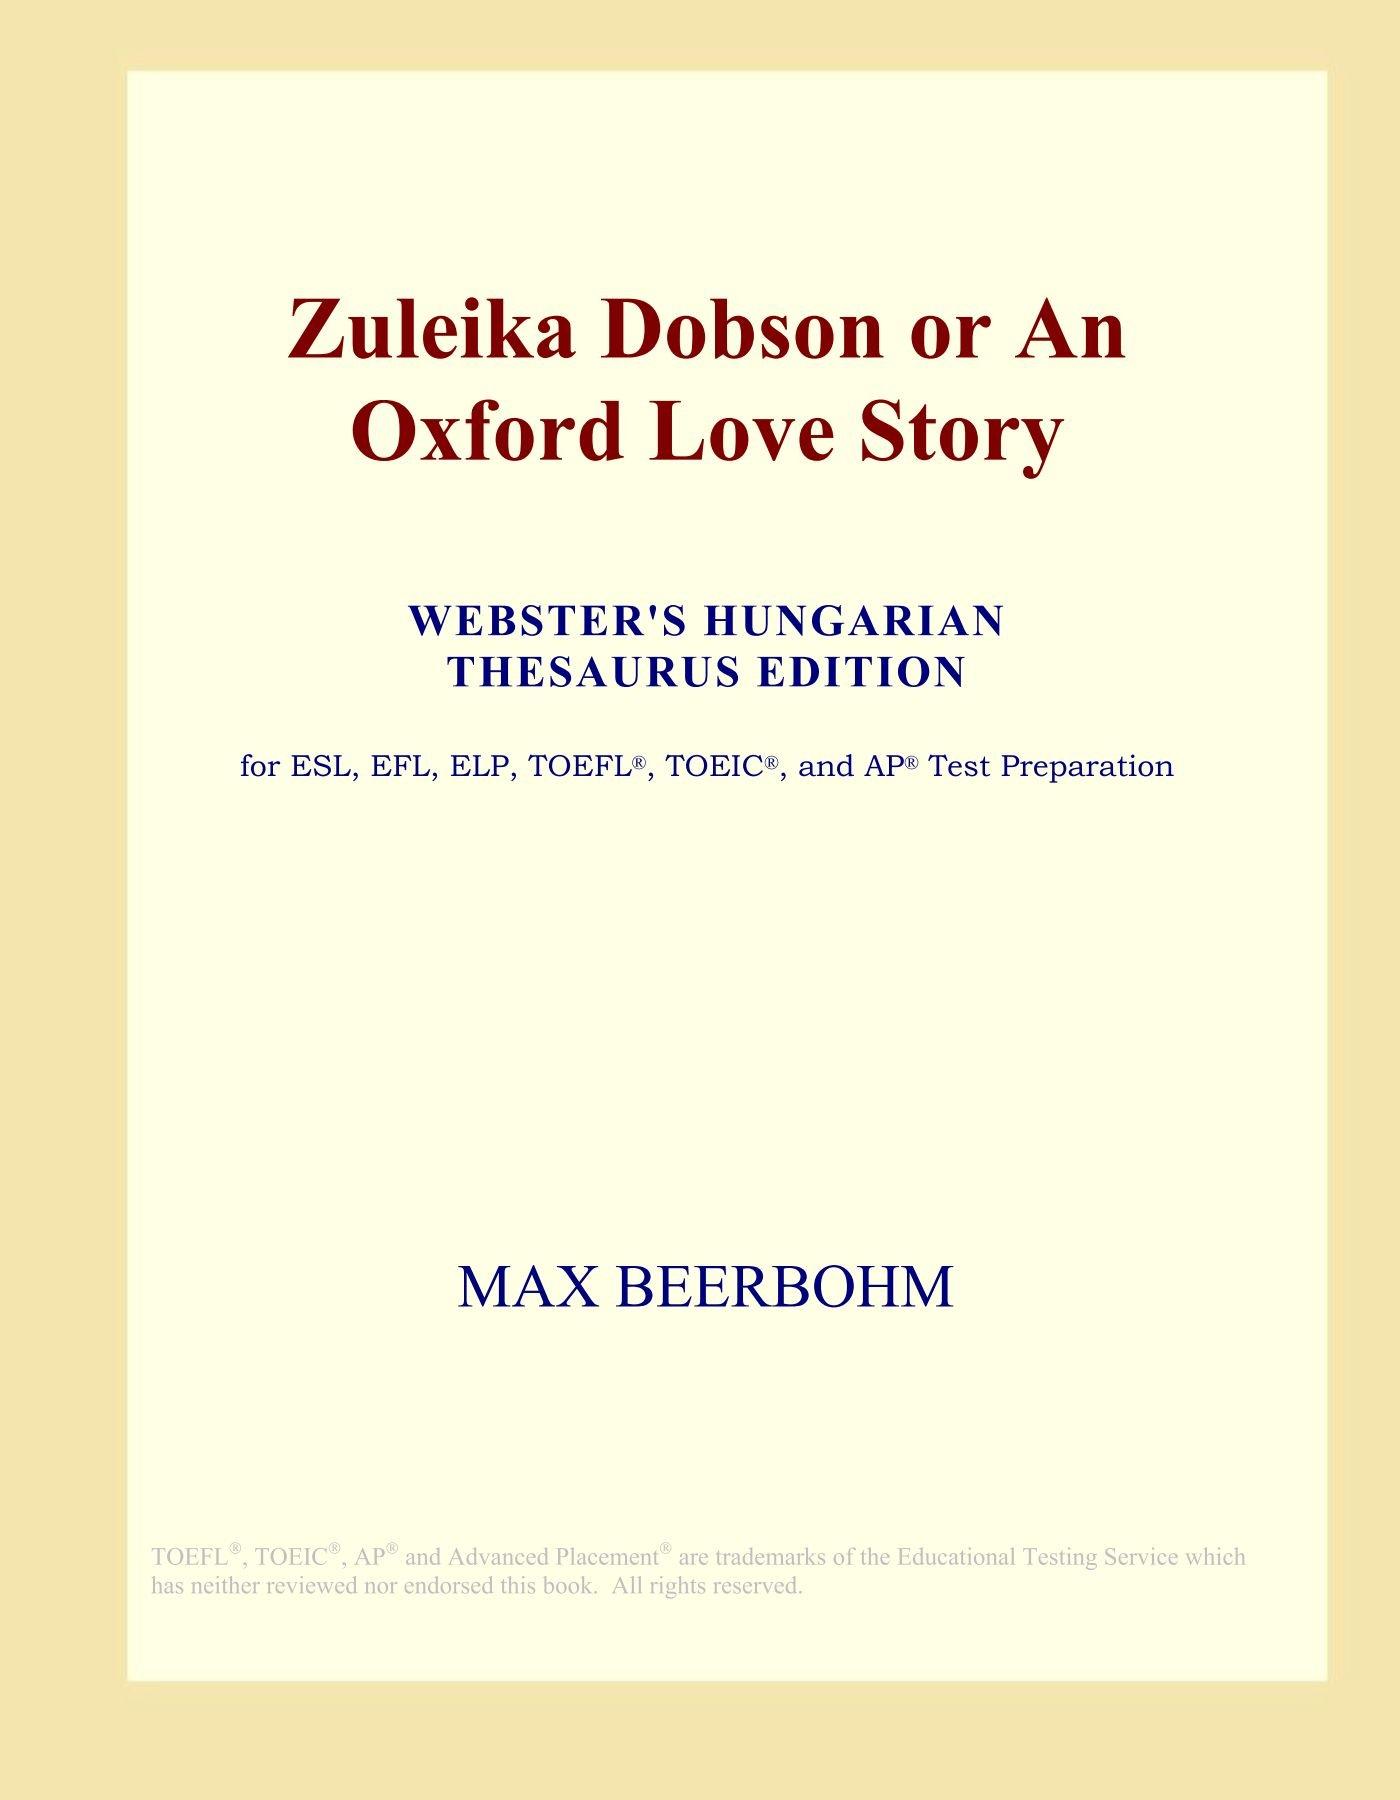 Zuleika Dobson or An Oxford Love Story (Webster's Hungarian Thesaurus Edition) pdf epub